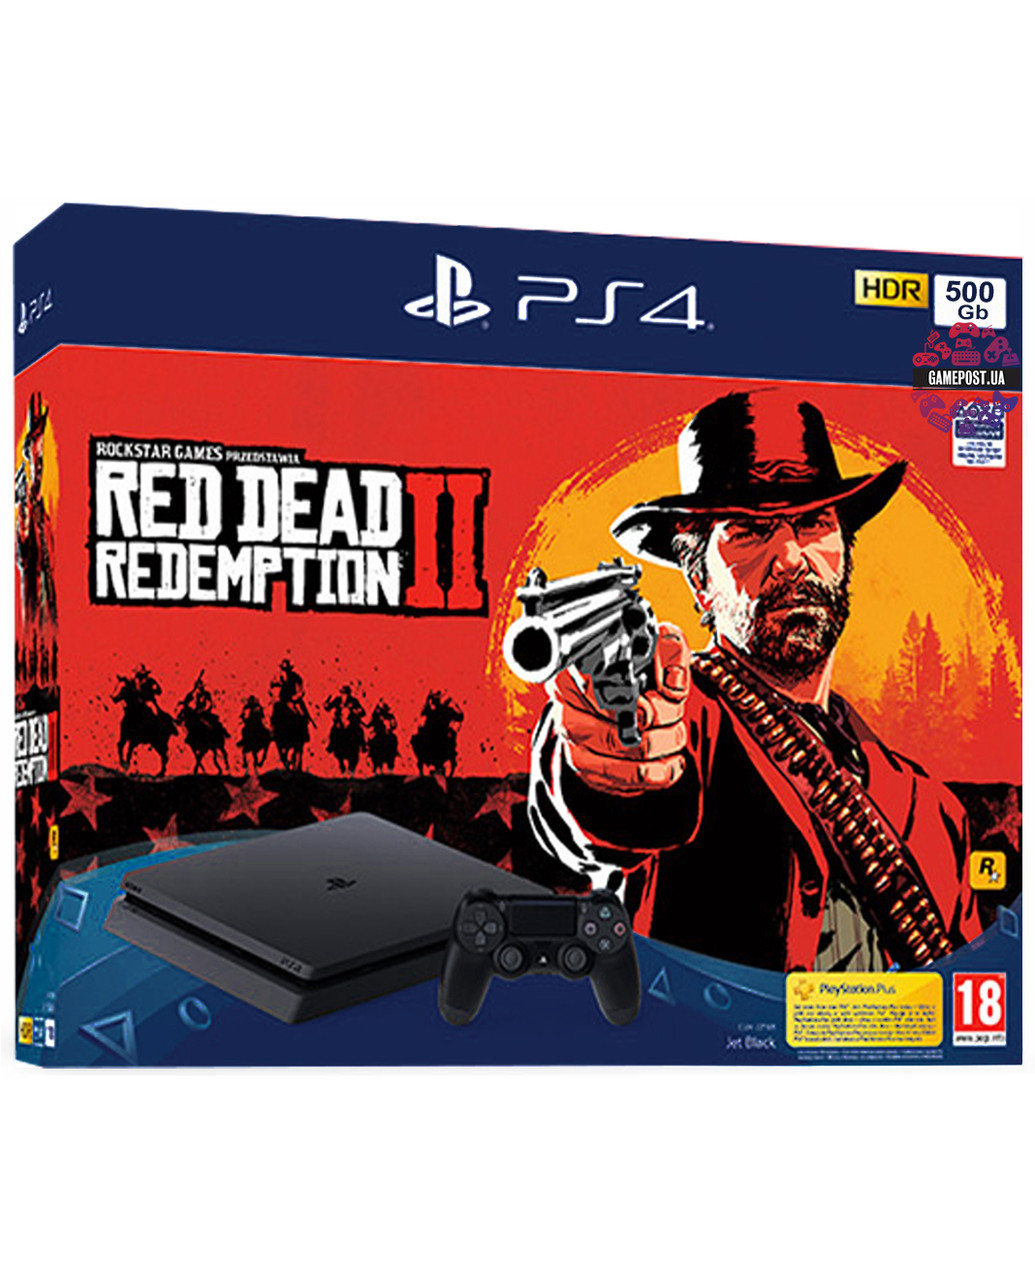 Playstation 4 Slim 500 GB + игра Red Dead Redemption 2Нет в наличии